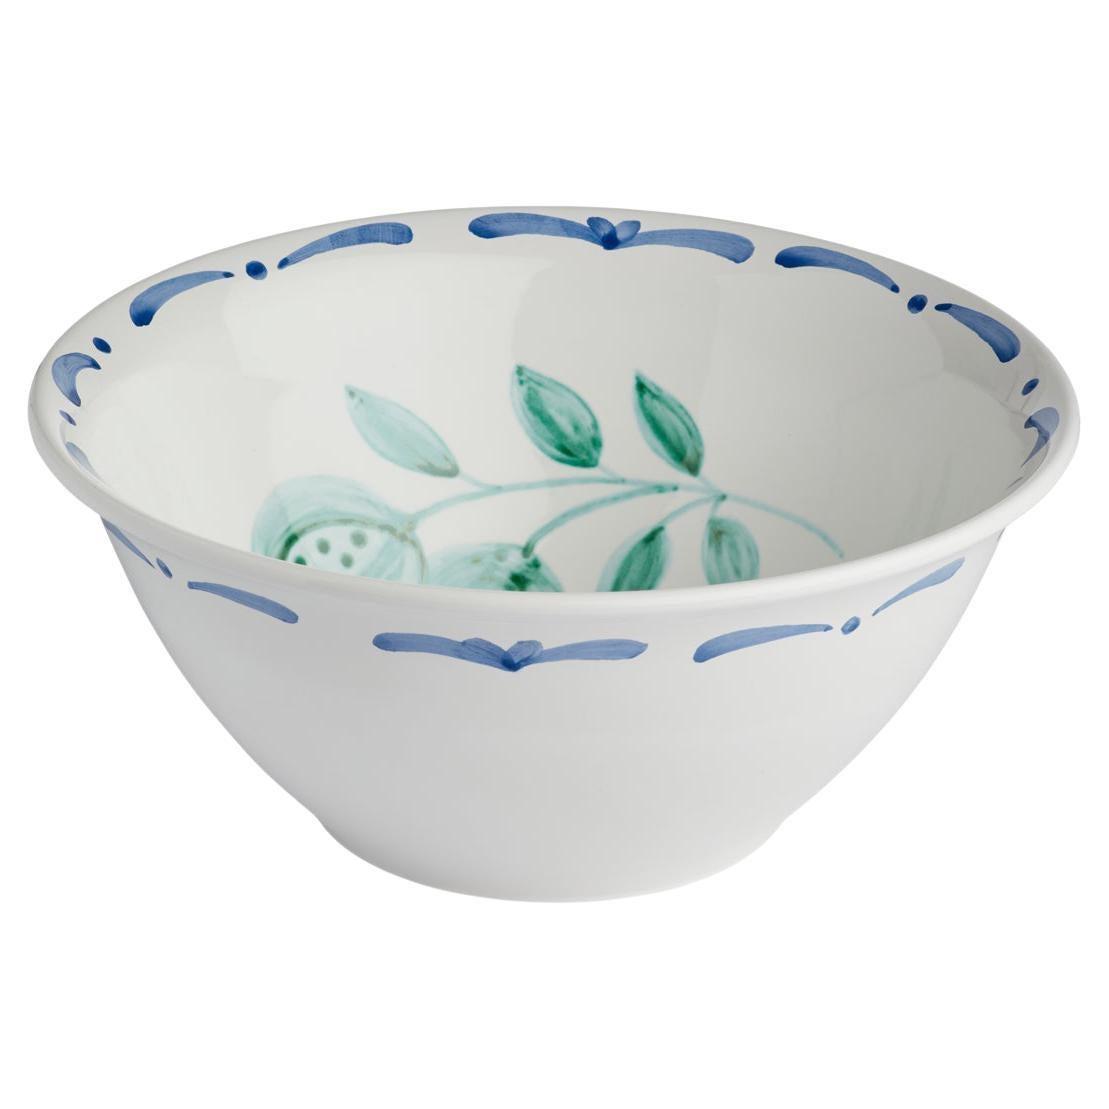 Large Salad Bowl Hand-Painted Ceramic Sofina Boutique Kitzbühel Austria